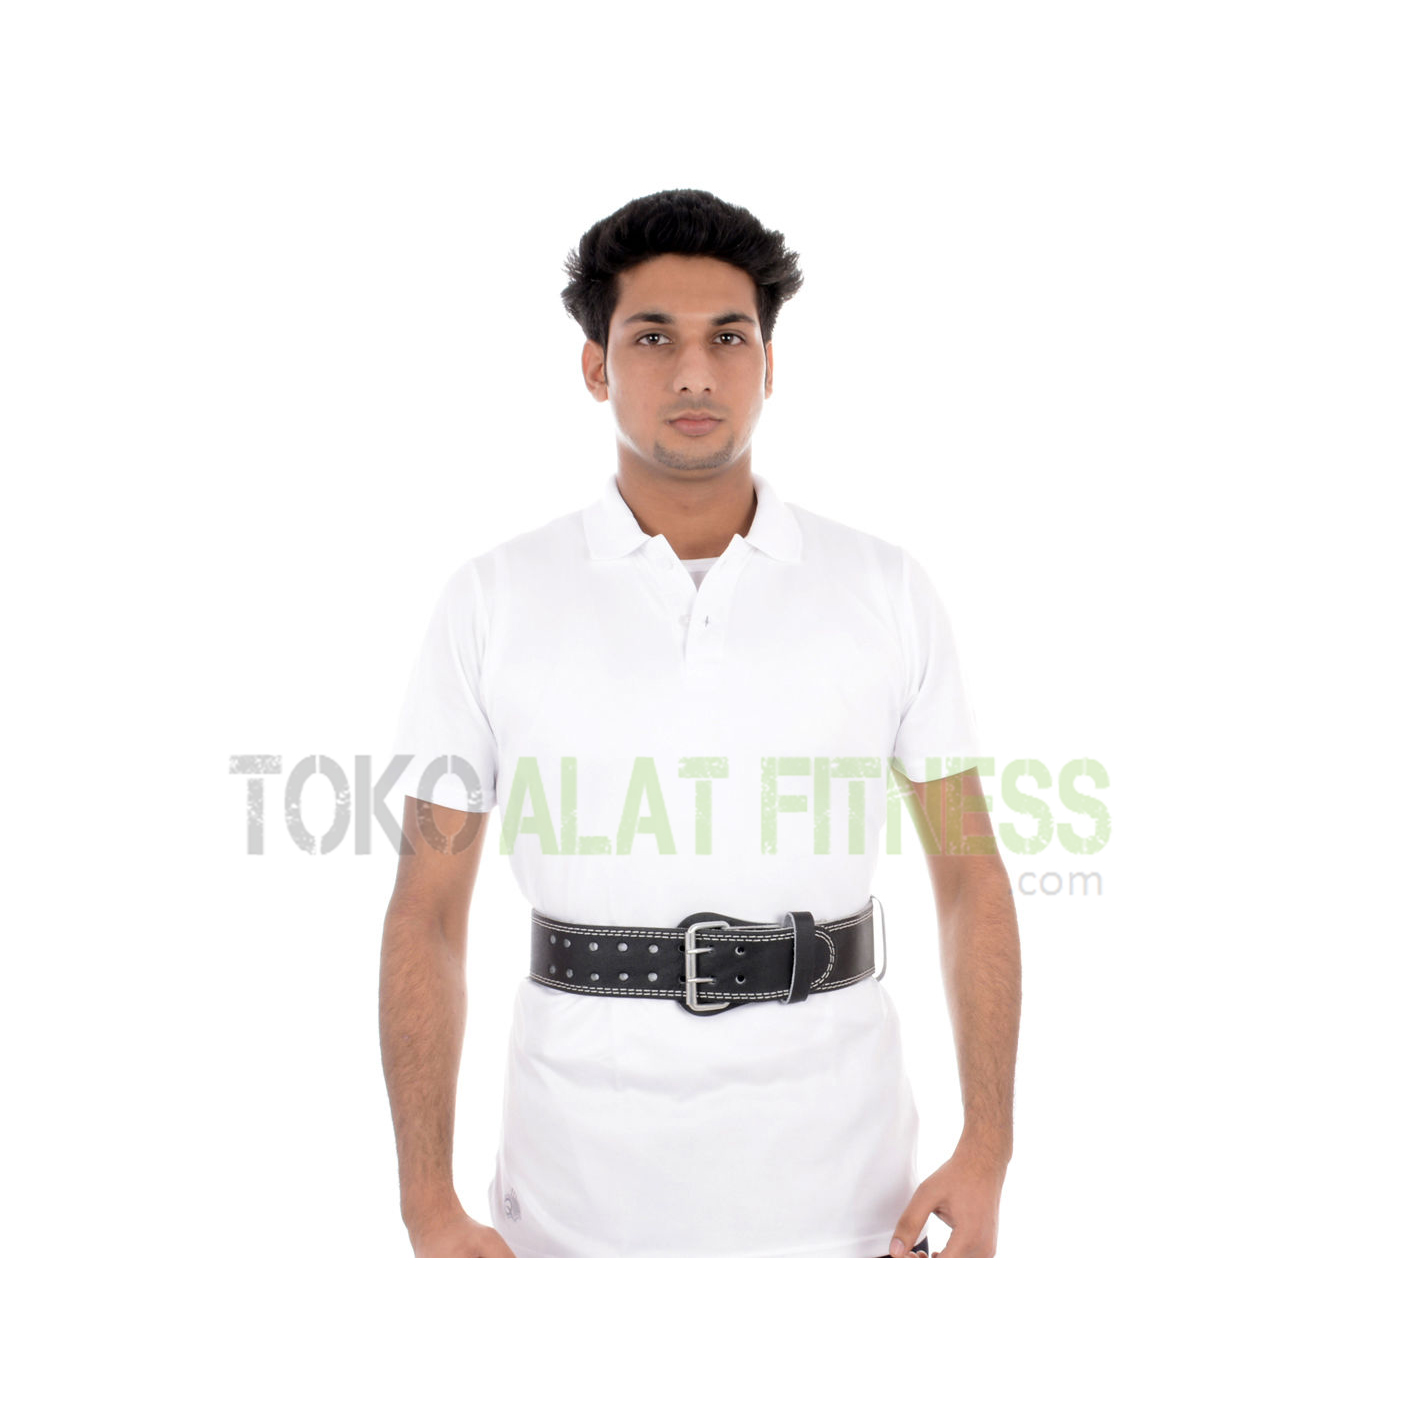 SABUK KULIT bs - Sabuk Fitness Kulit (Weight Lifting Belt) M Hitam Body Sculpture